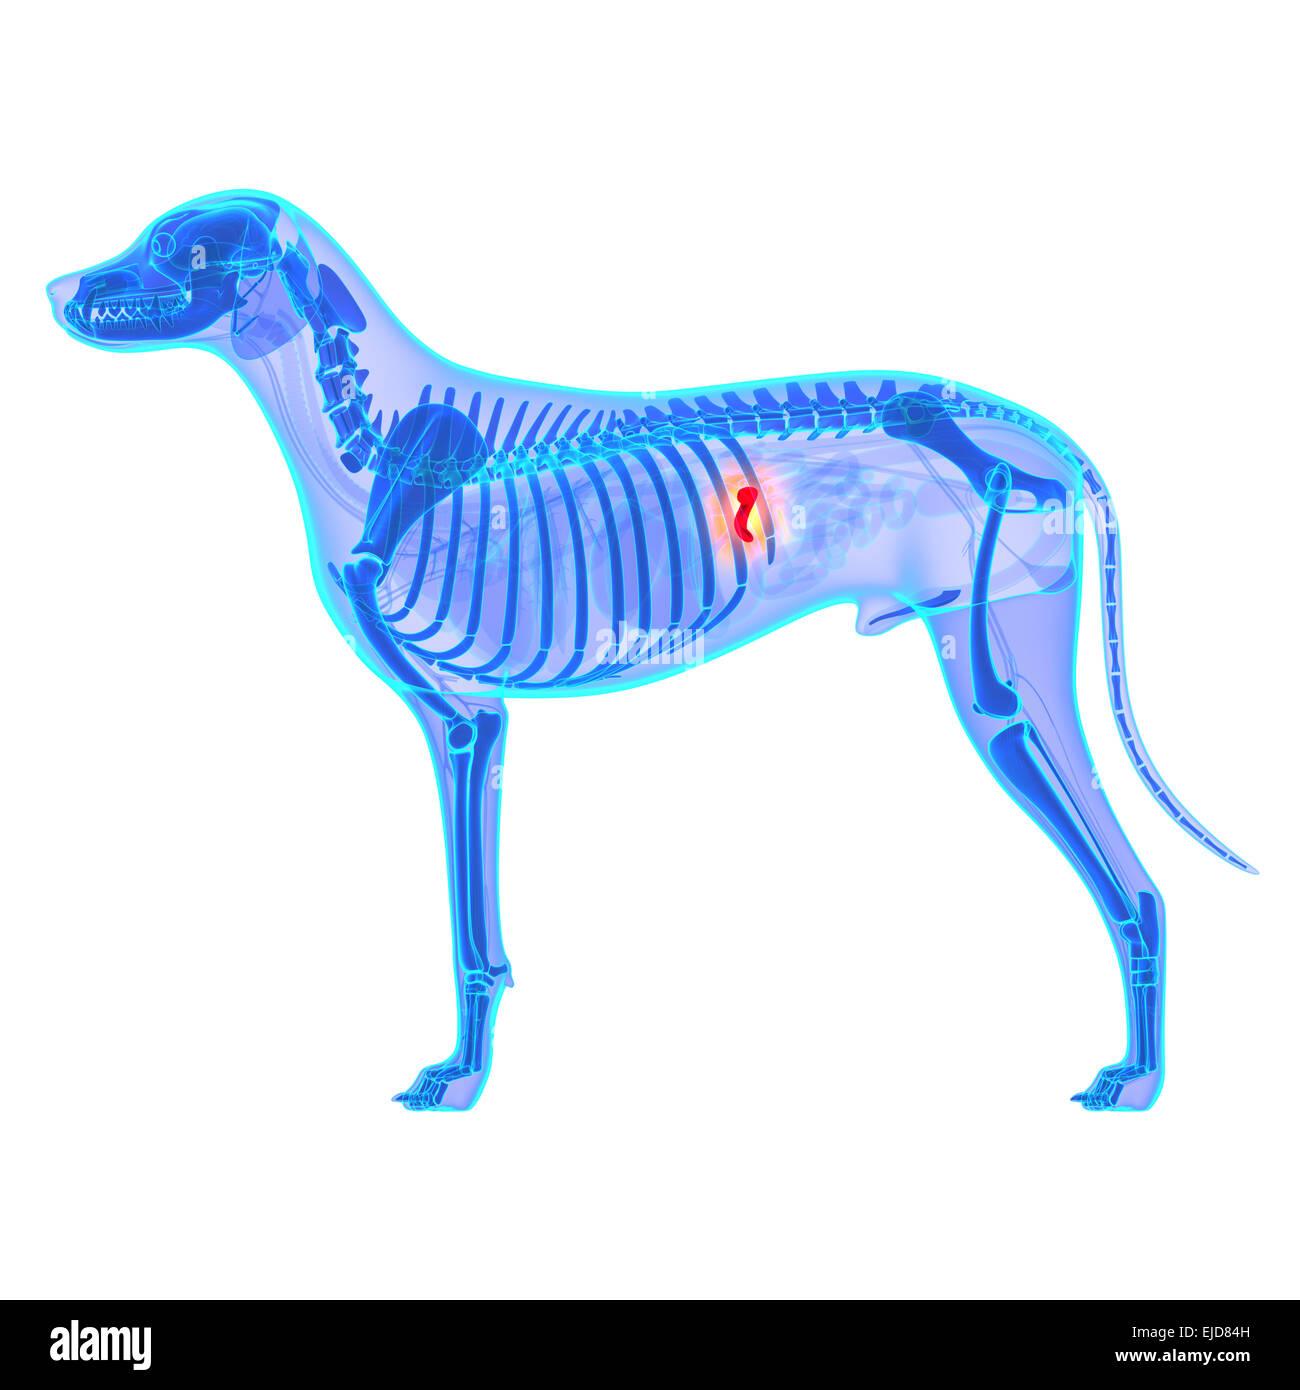 Dog Gallbladder Anatomy - Canis Lupus Familiaris Anatomy - isolated ...